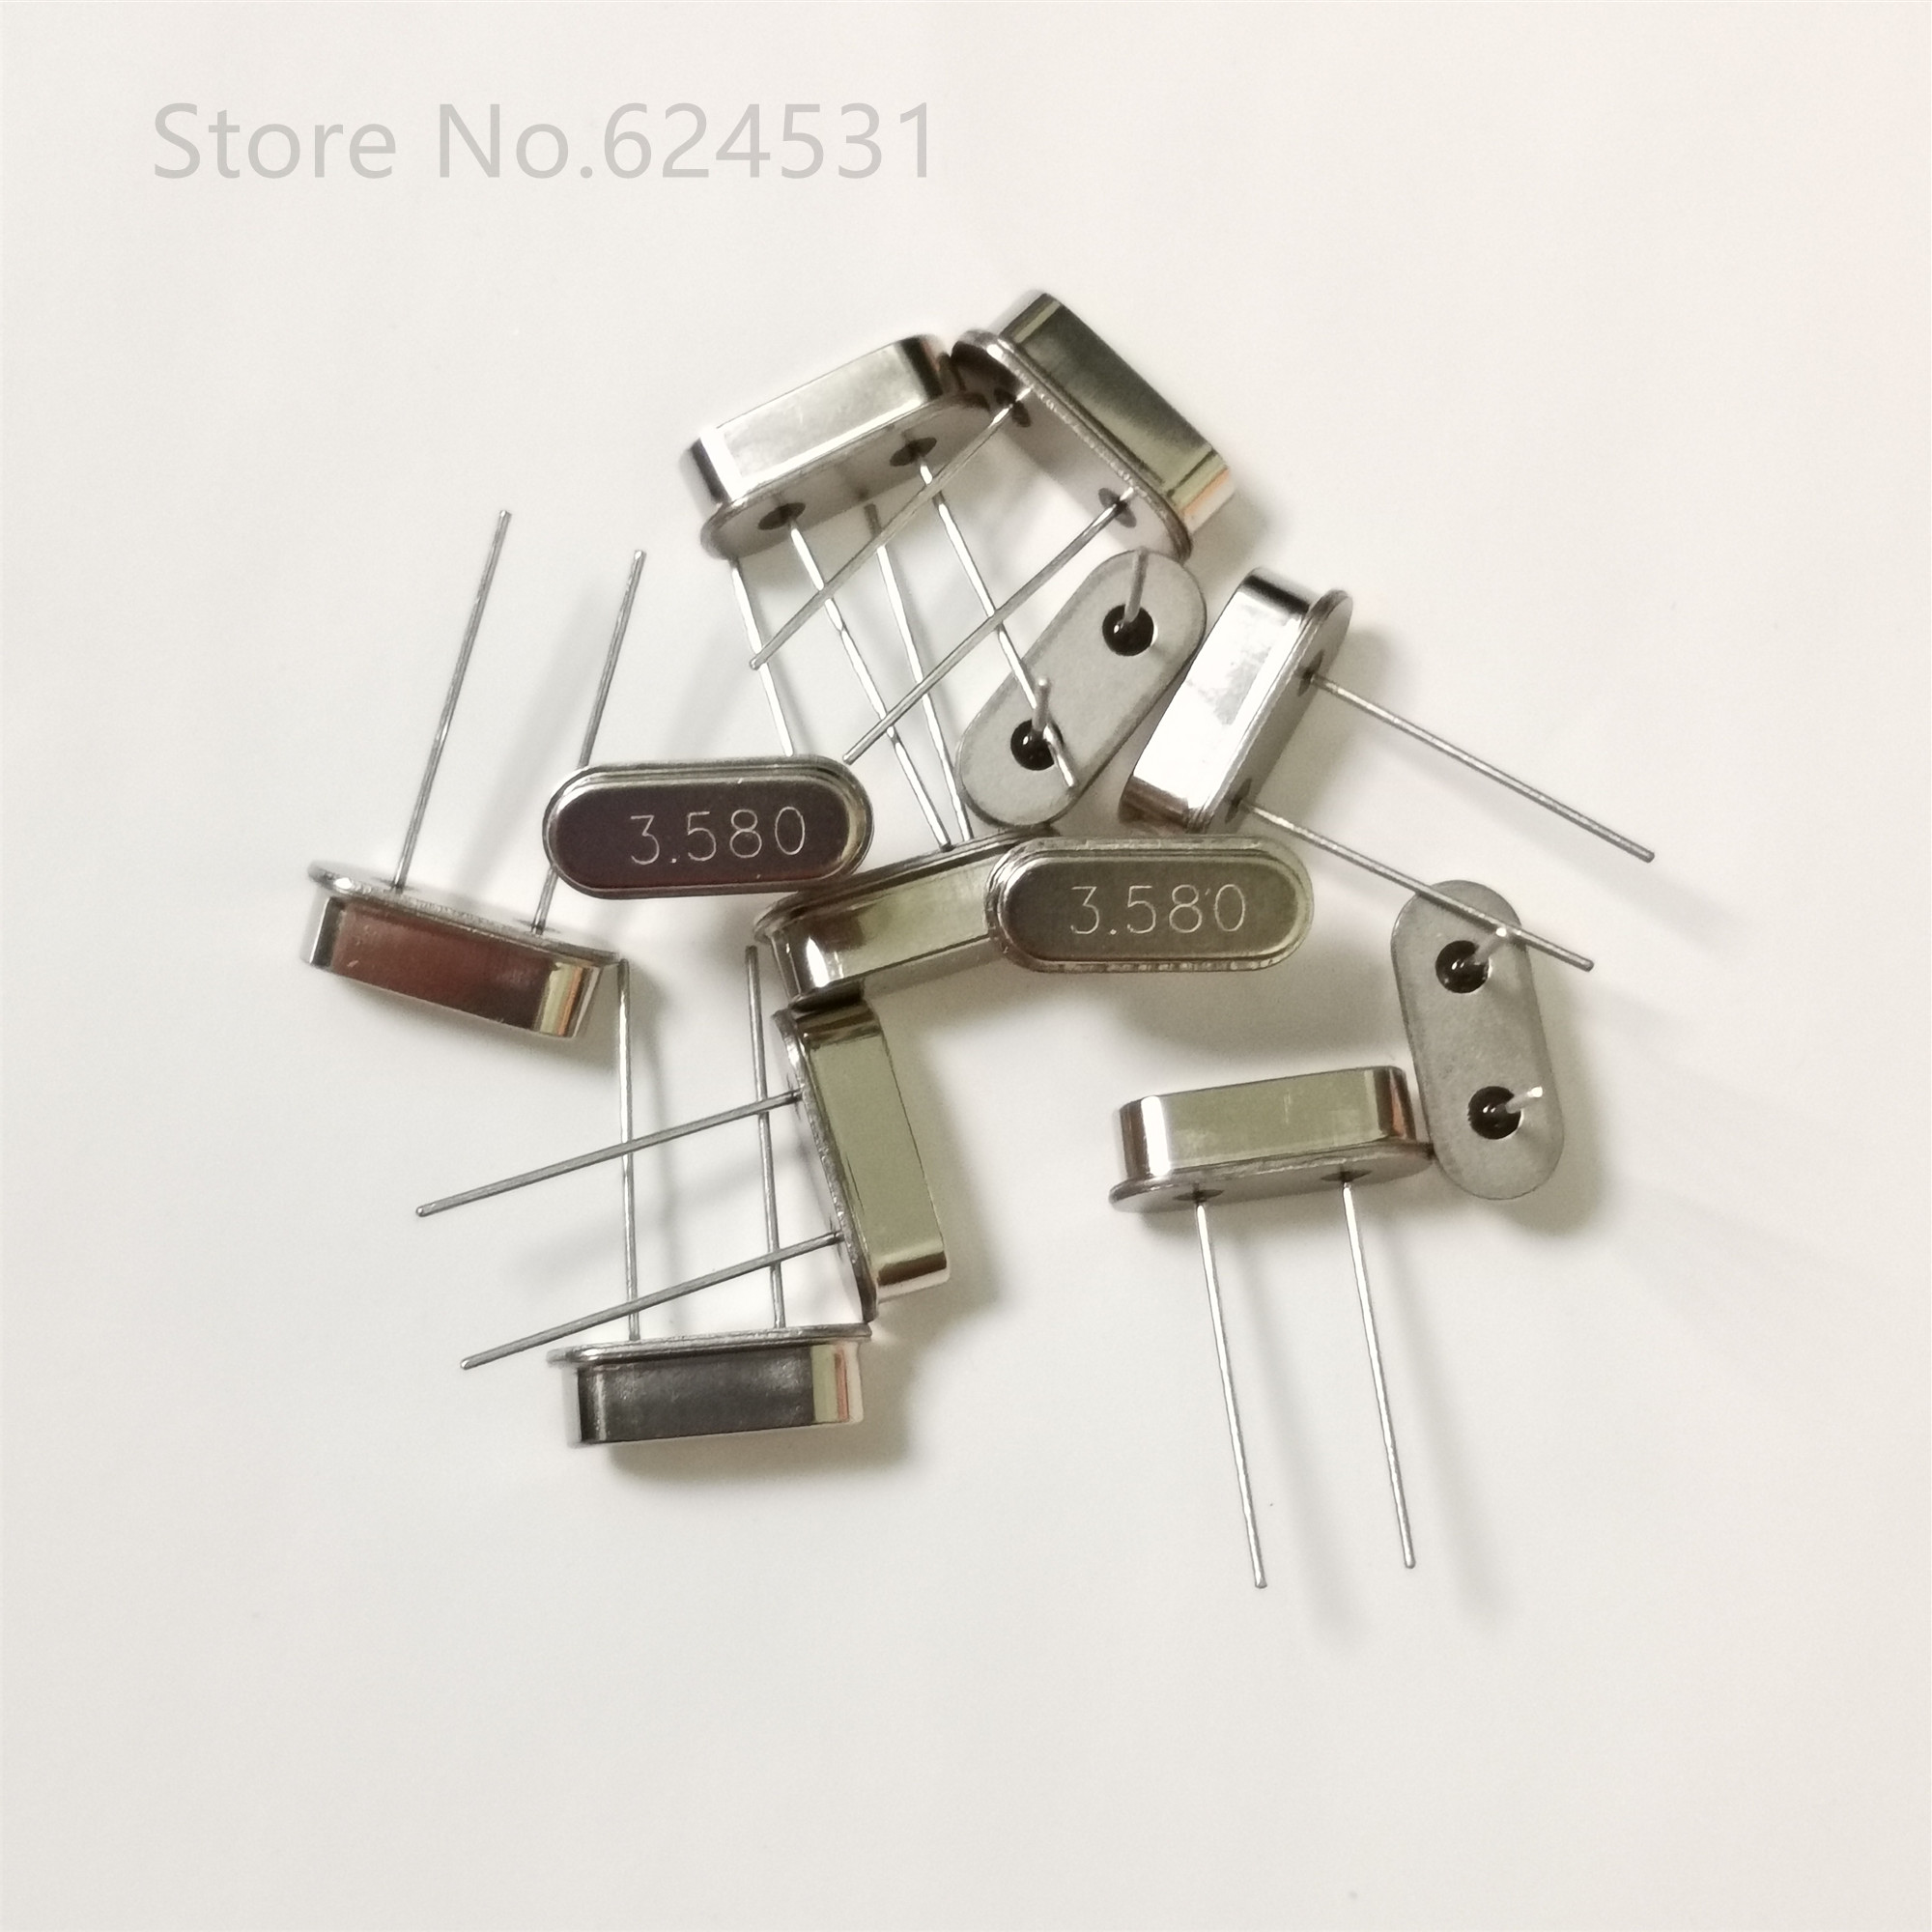 10pcs In-line Passive Crystal Oscillator 3.58M 3.580MHZ 49S 3.58MHZ HC-49S DIP 2P Resonator